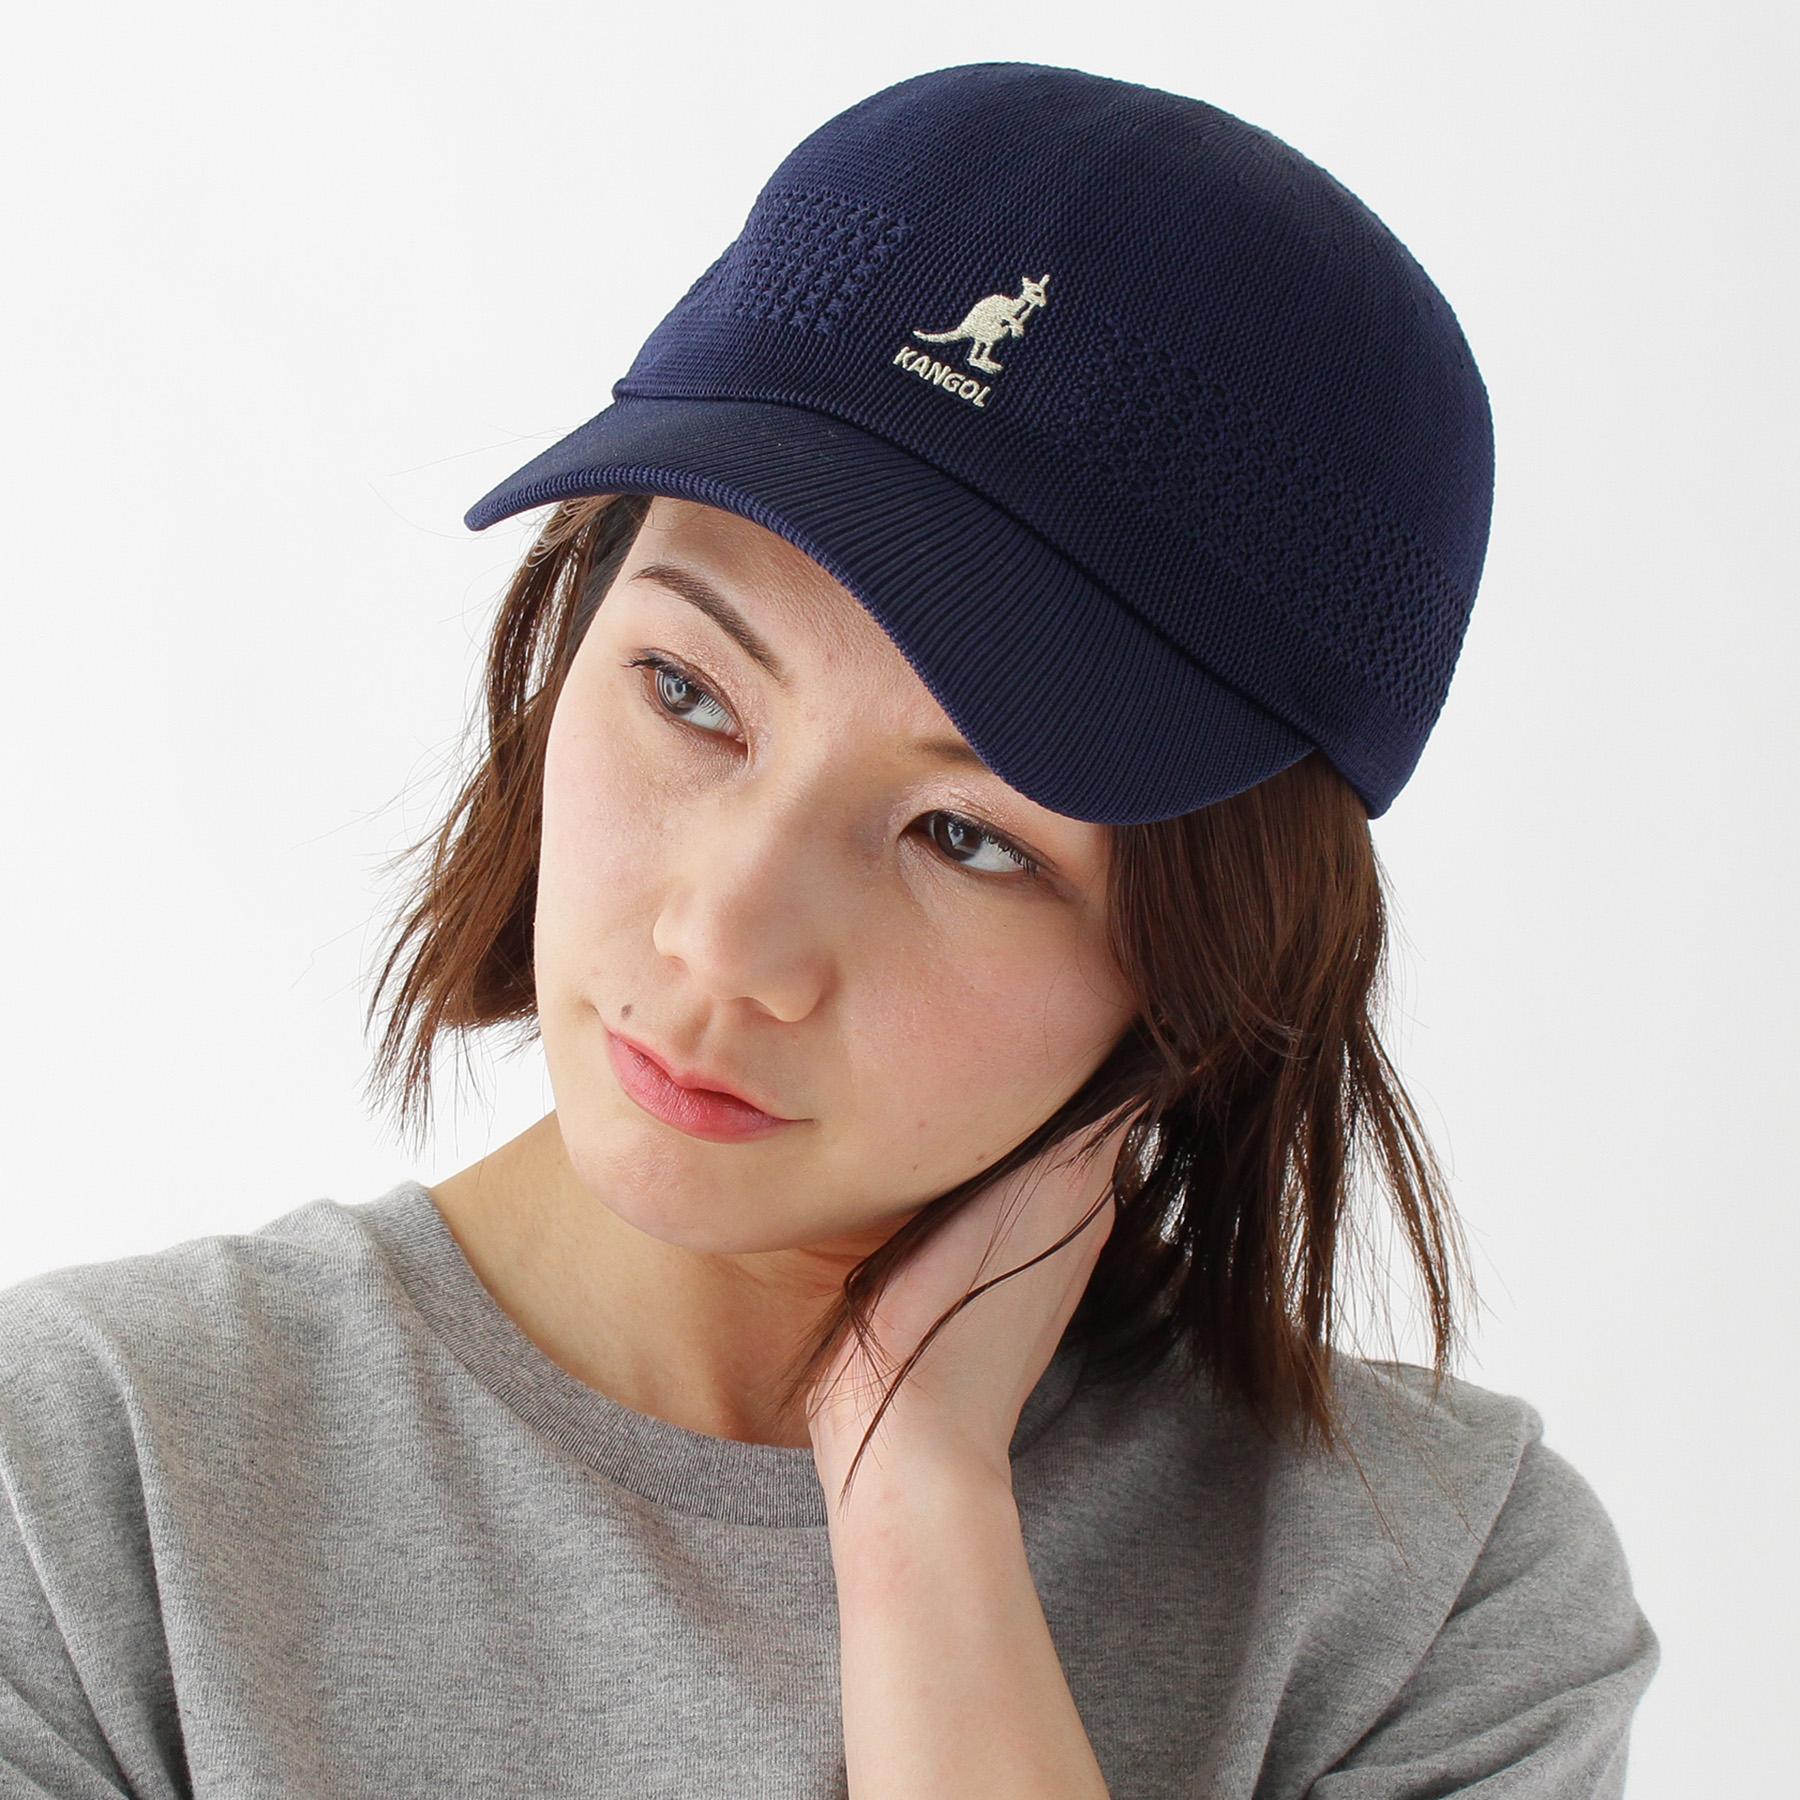 【BASECONTROL LADYS (ベース コントロール レディス)】【WEB限定】KANGOL/カンゴール スペースキャップレディース 帽子|キャップ ネイビー